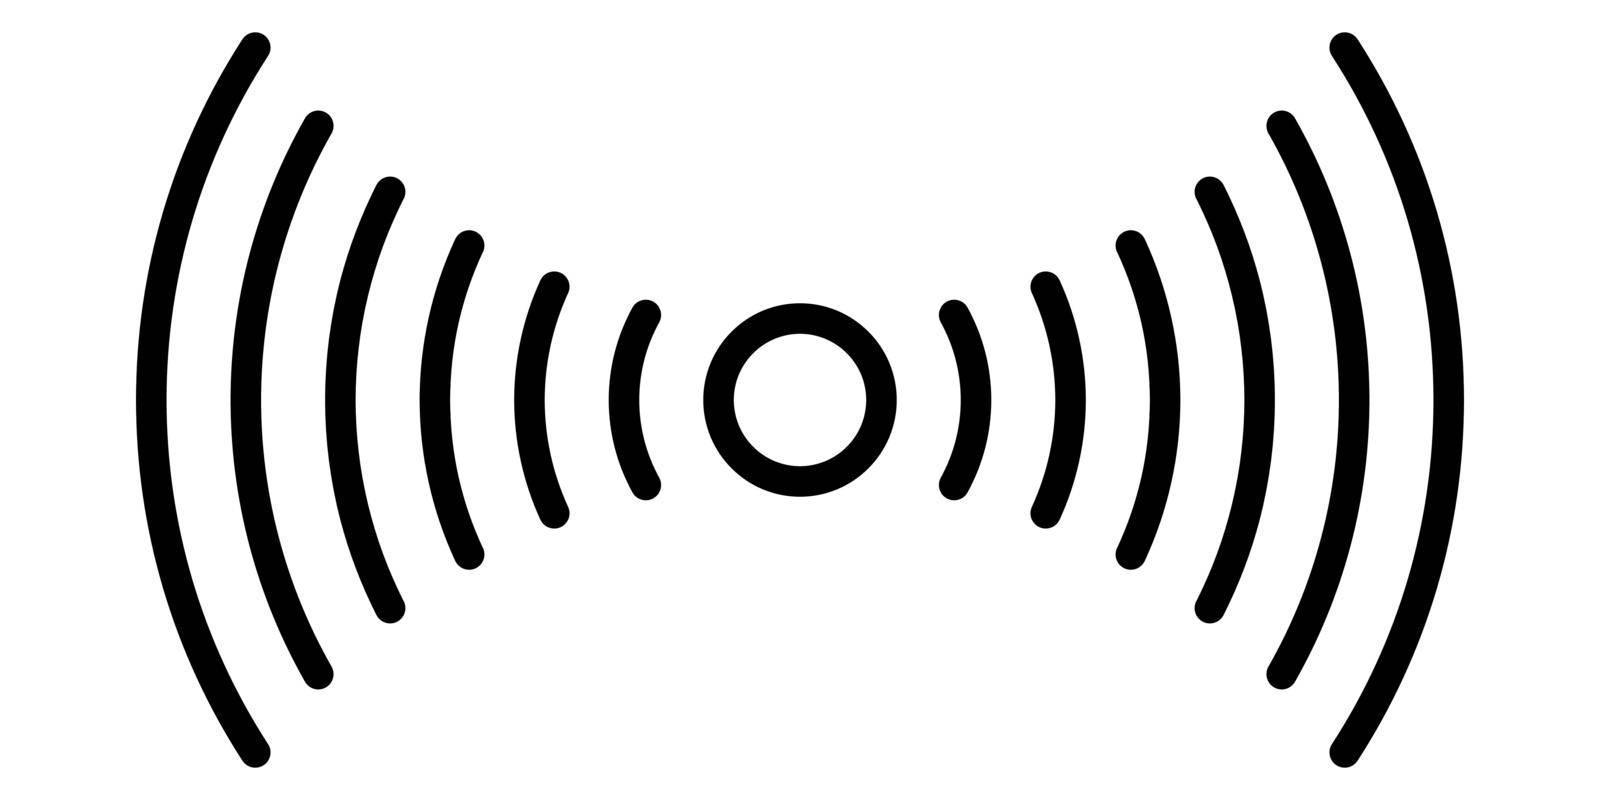 Smartphone fingerprint sensor icon simple linear logo stock illustration